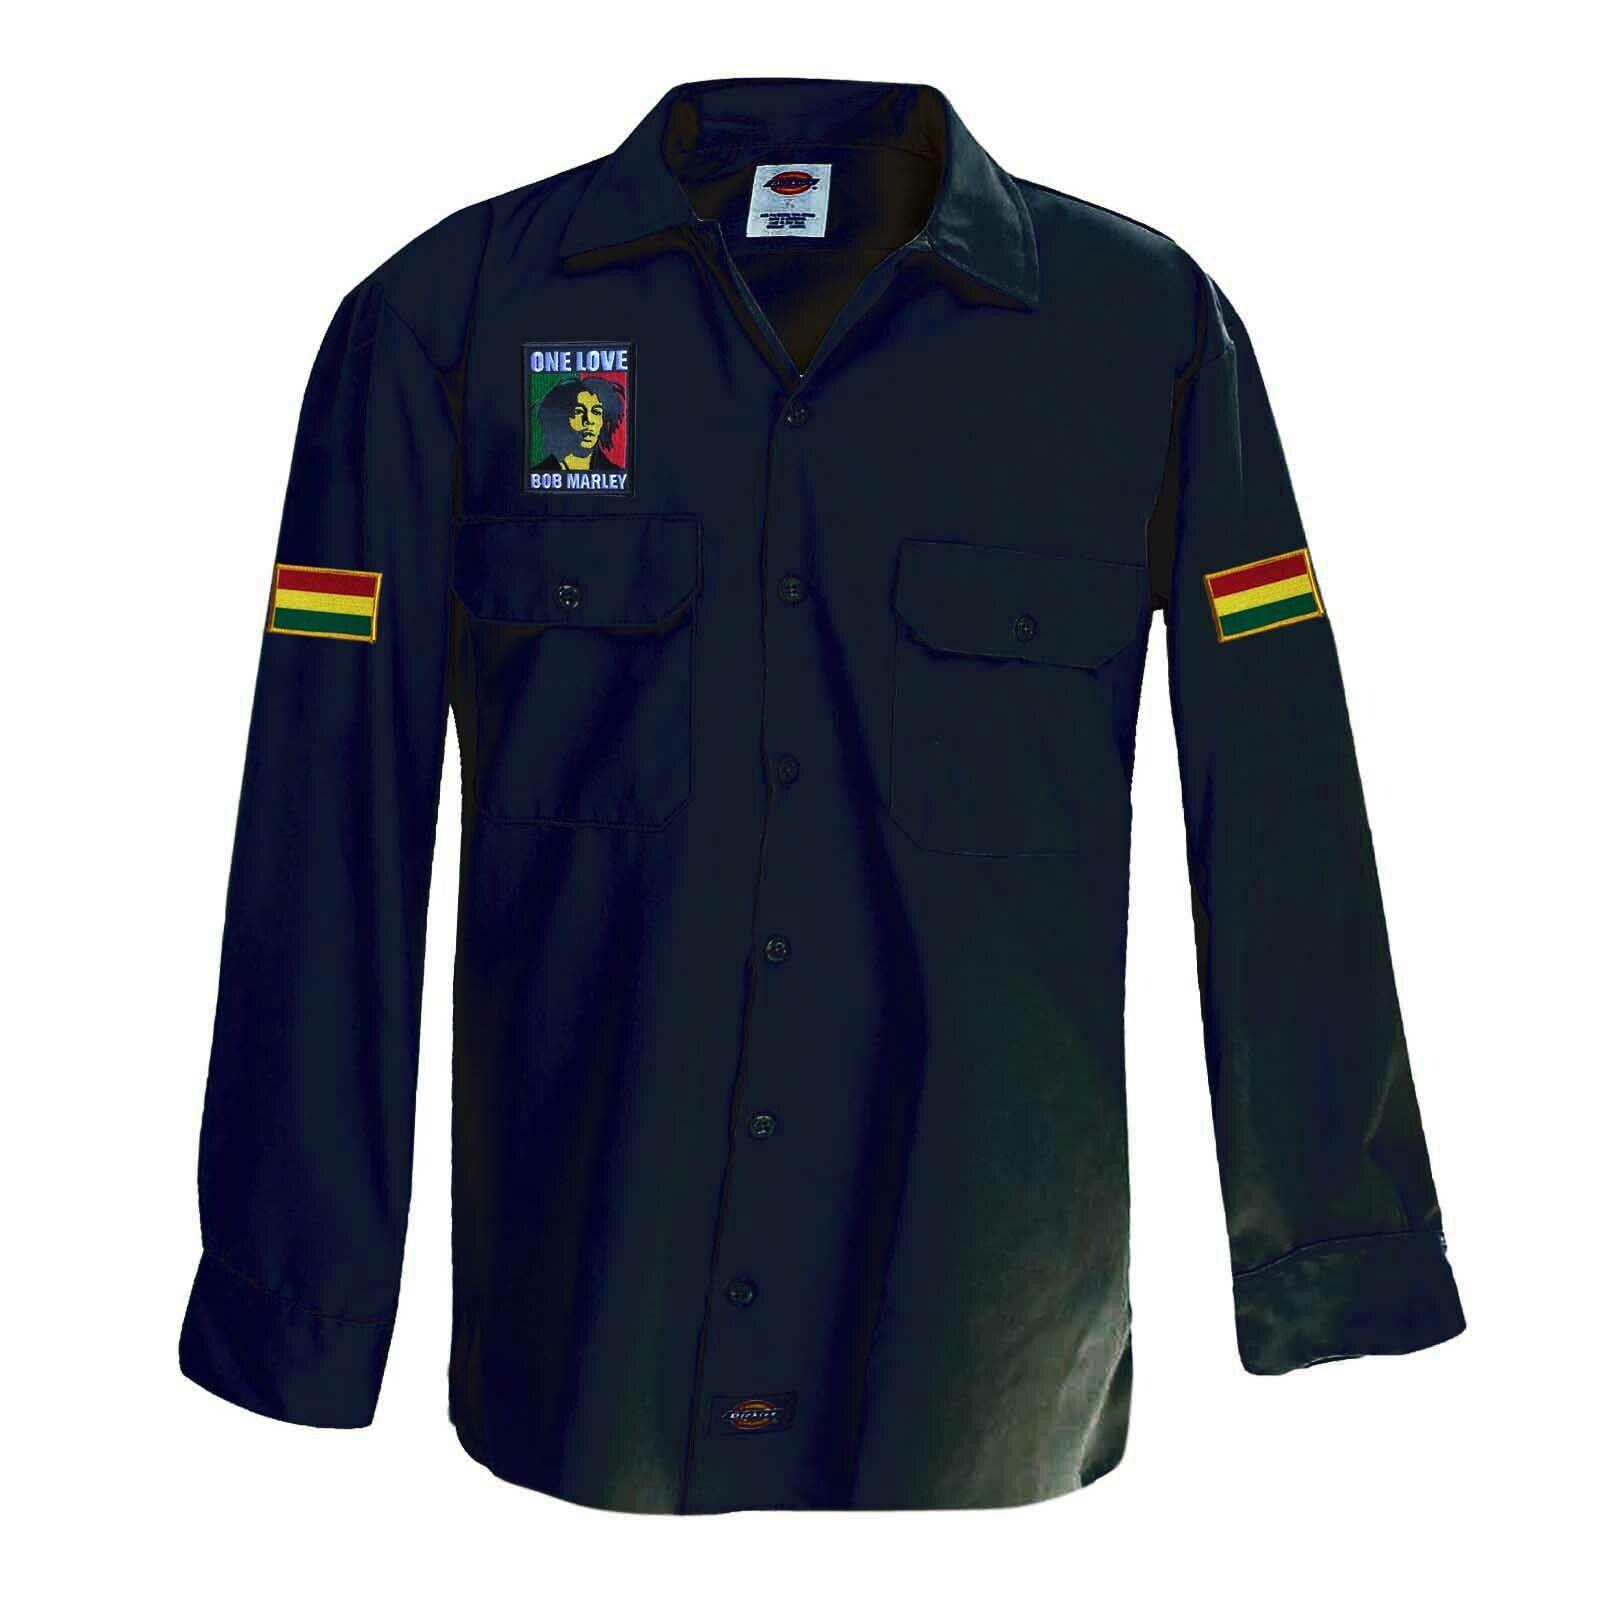 Reggae Jamaica Marley Roots Africa reggae jamaica Patch Shirt Rasta [ XL ]